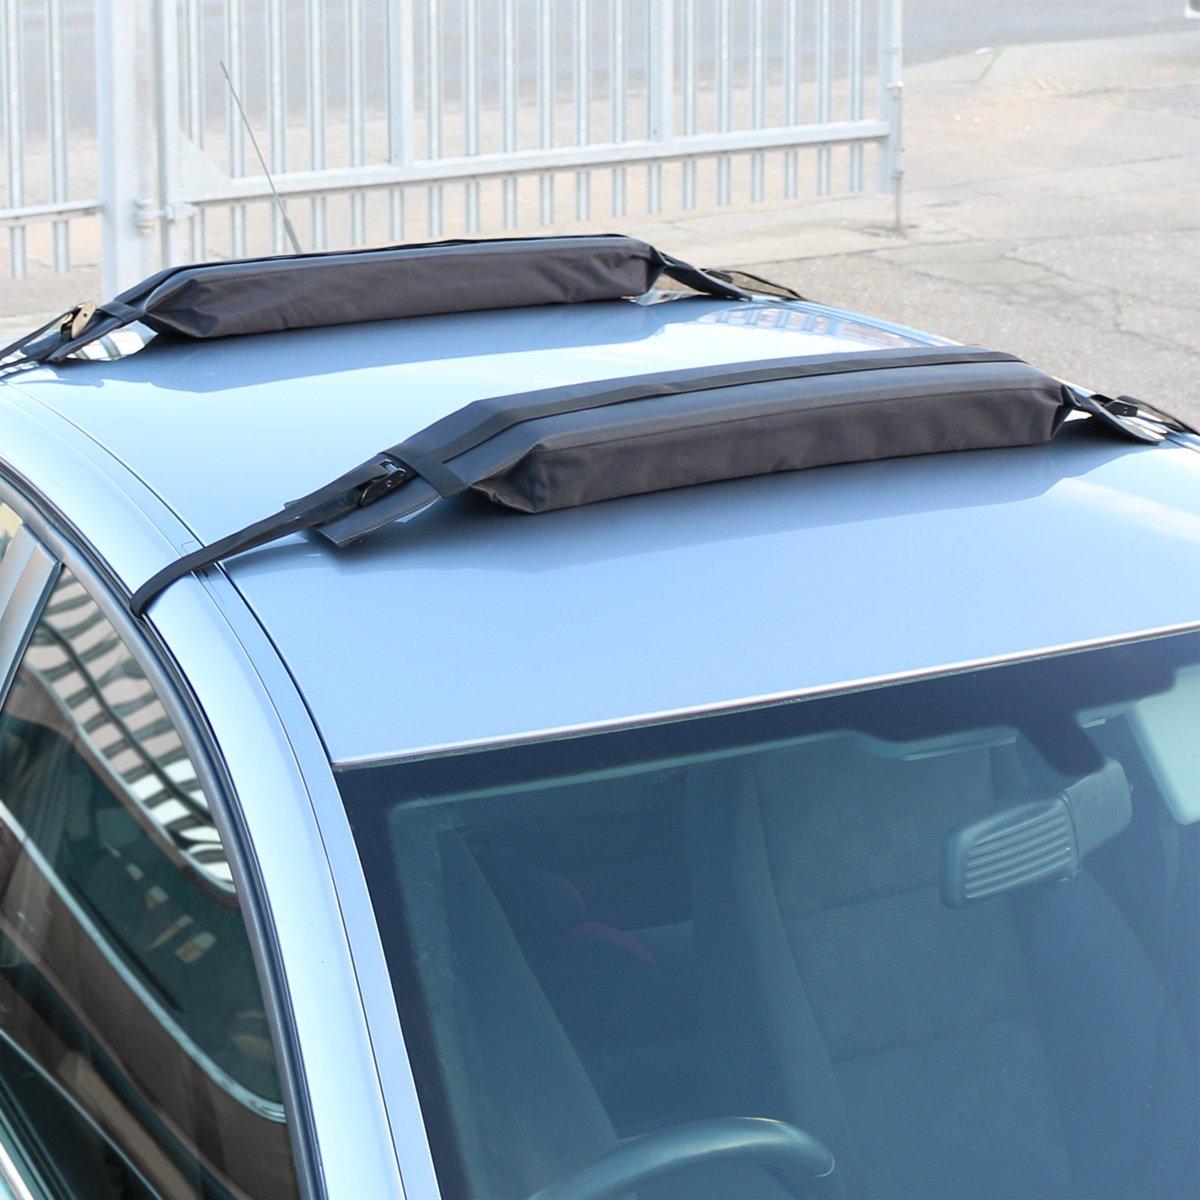 Hardcastle 80cm Universal Soft Car Roof Bars